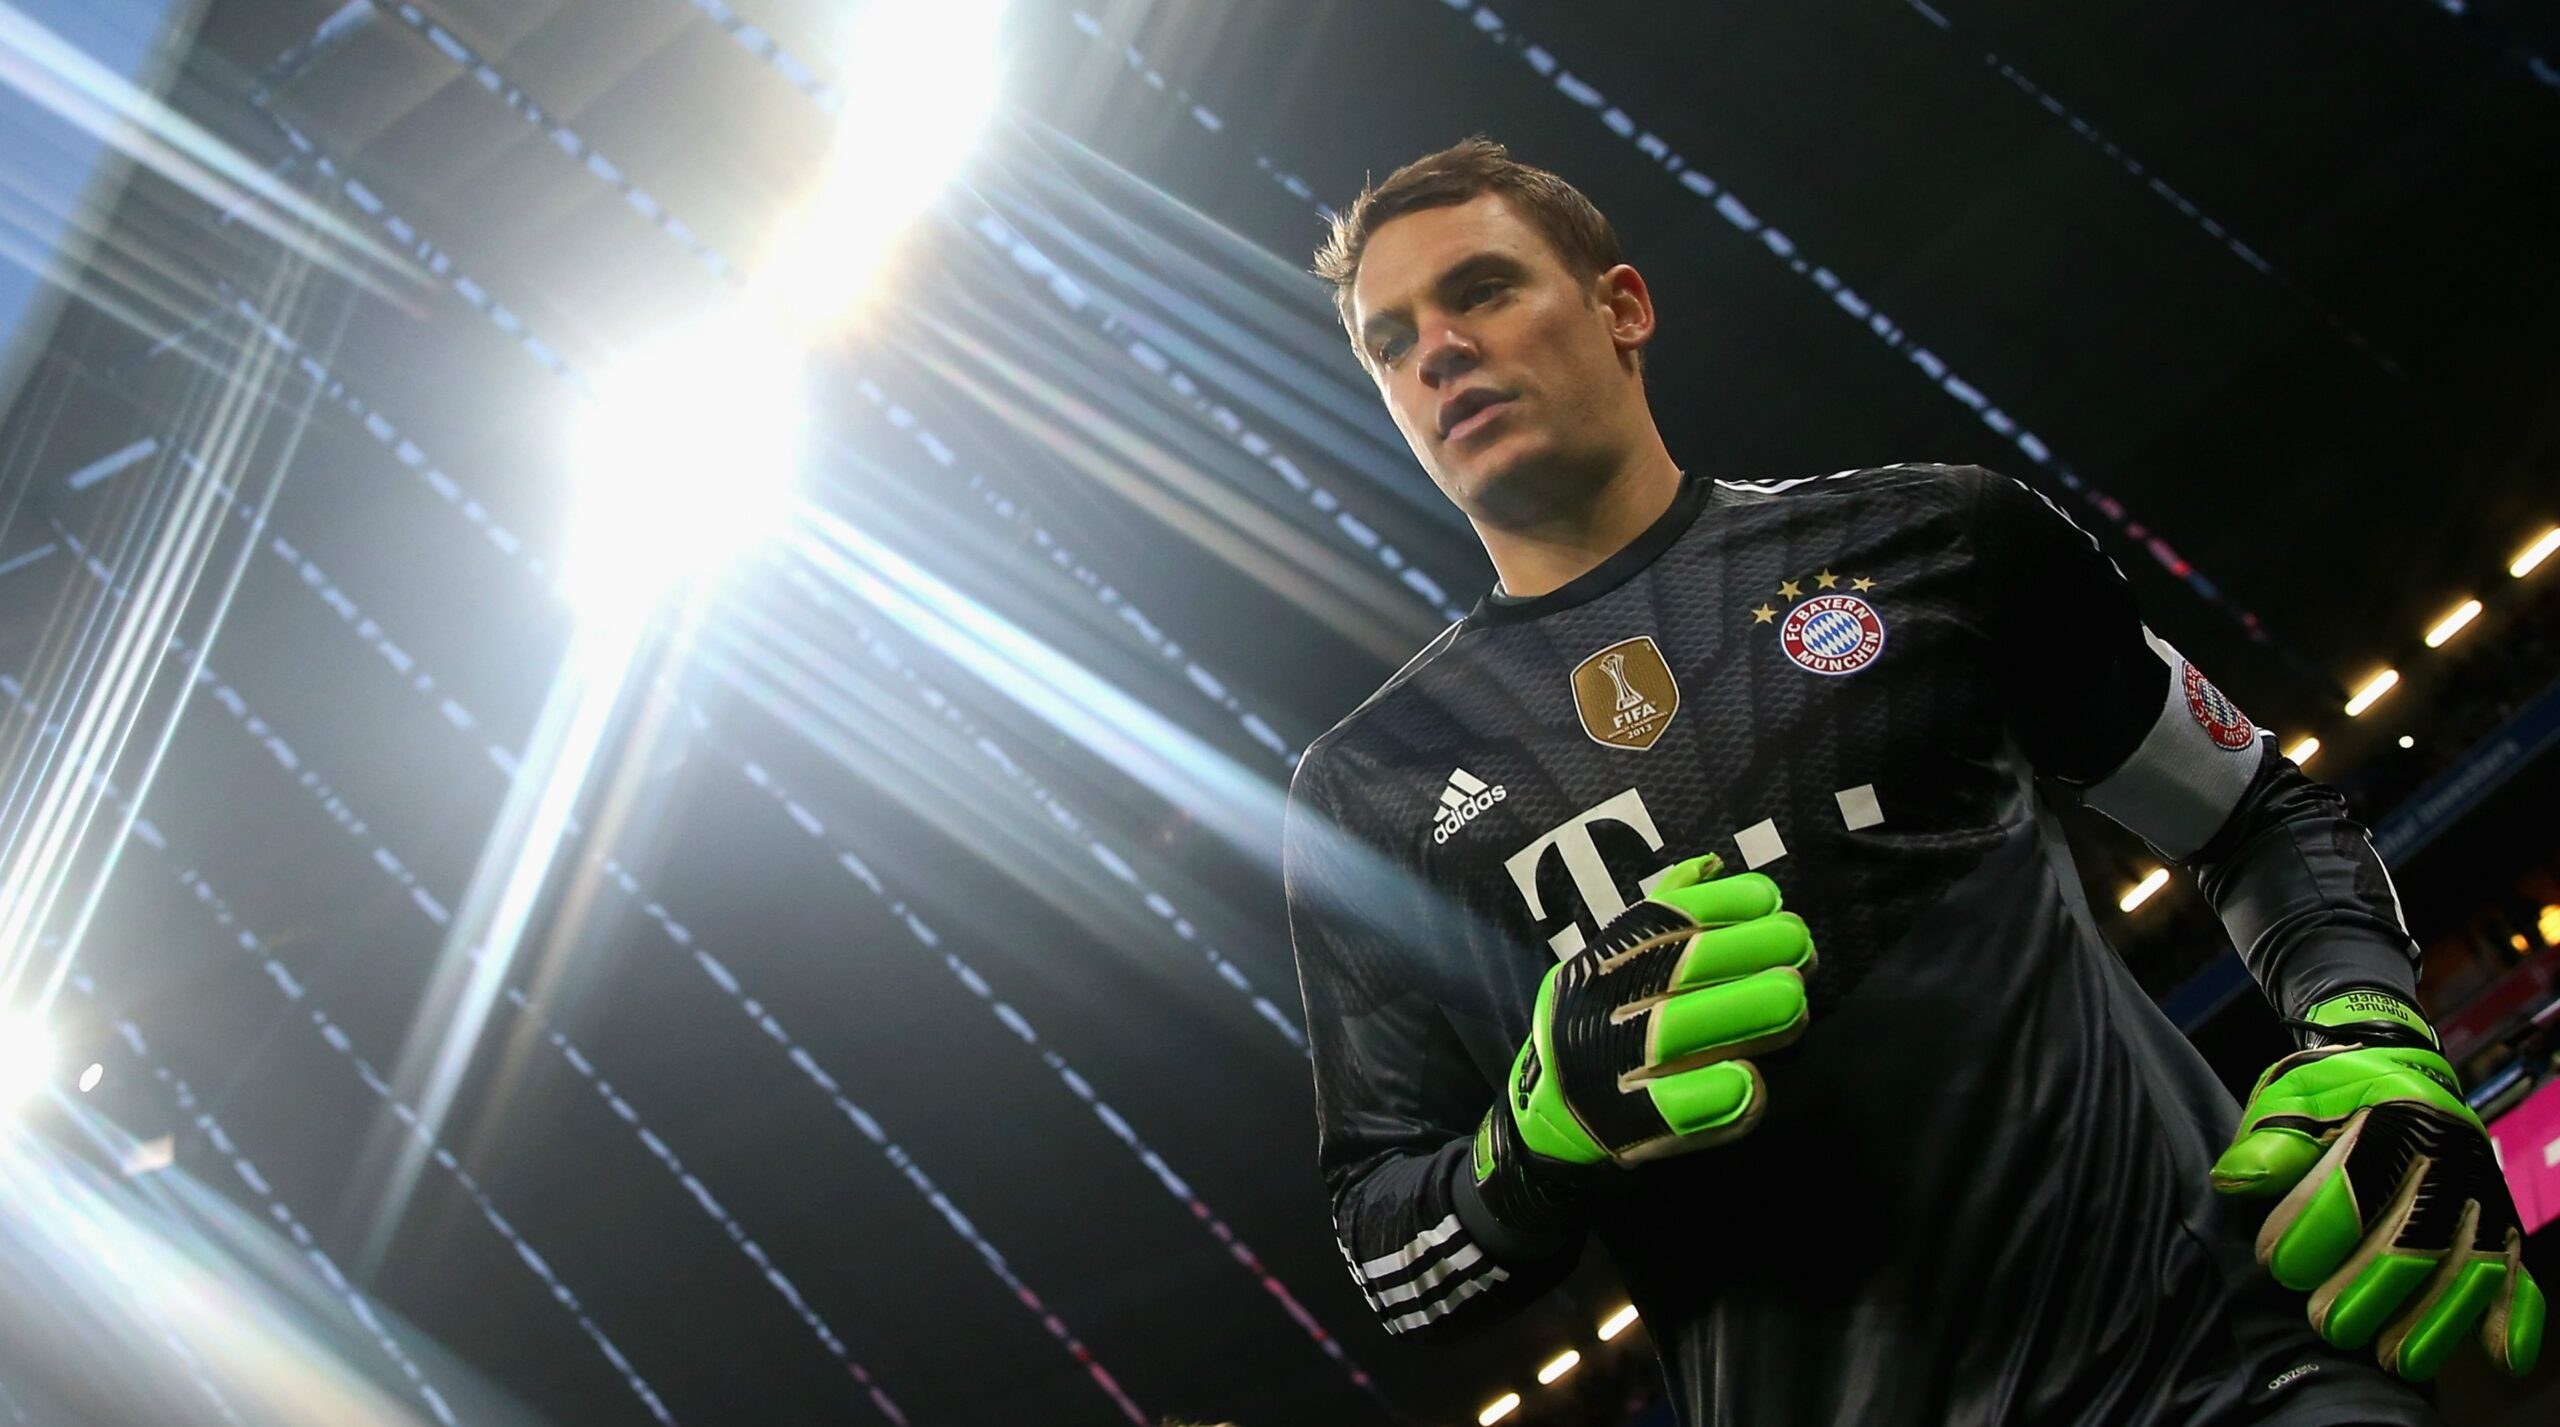 Manuel Neuer Background images